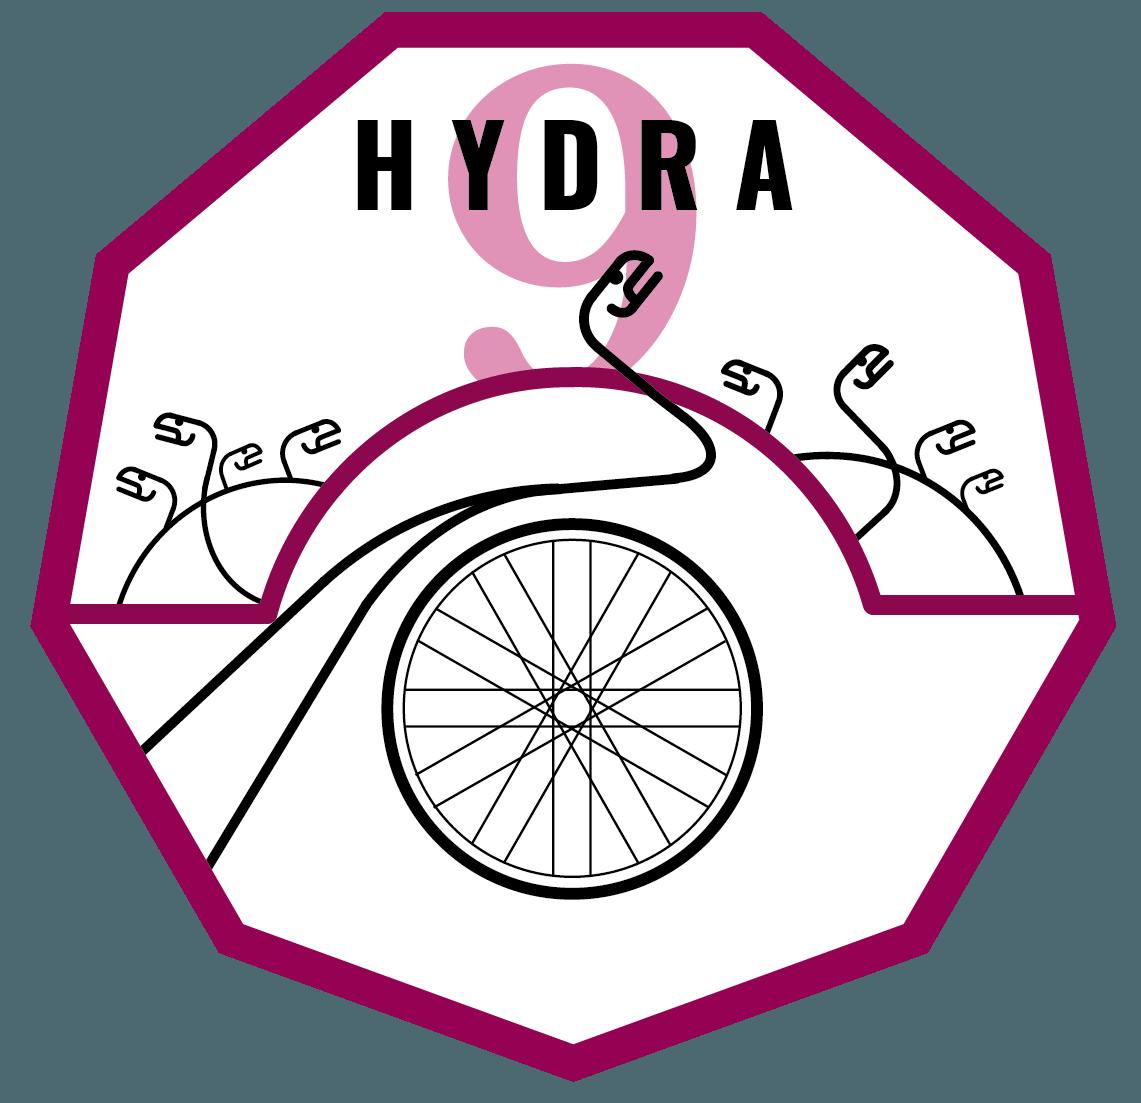 hydra_9_badge